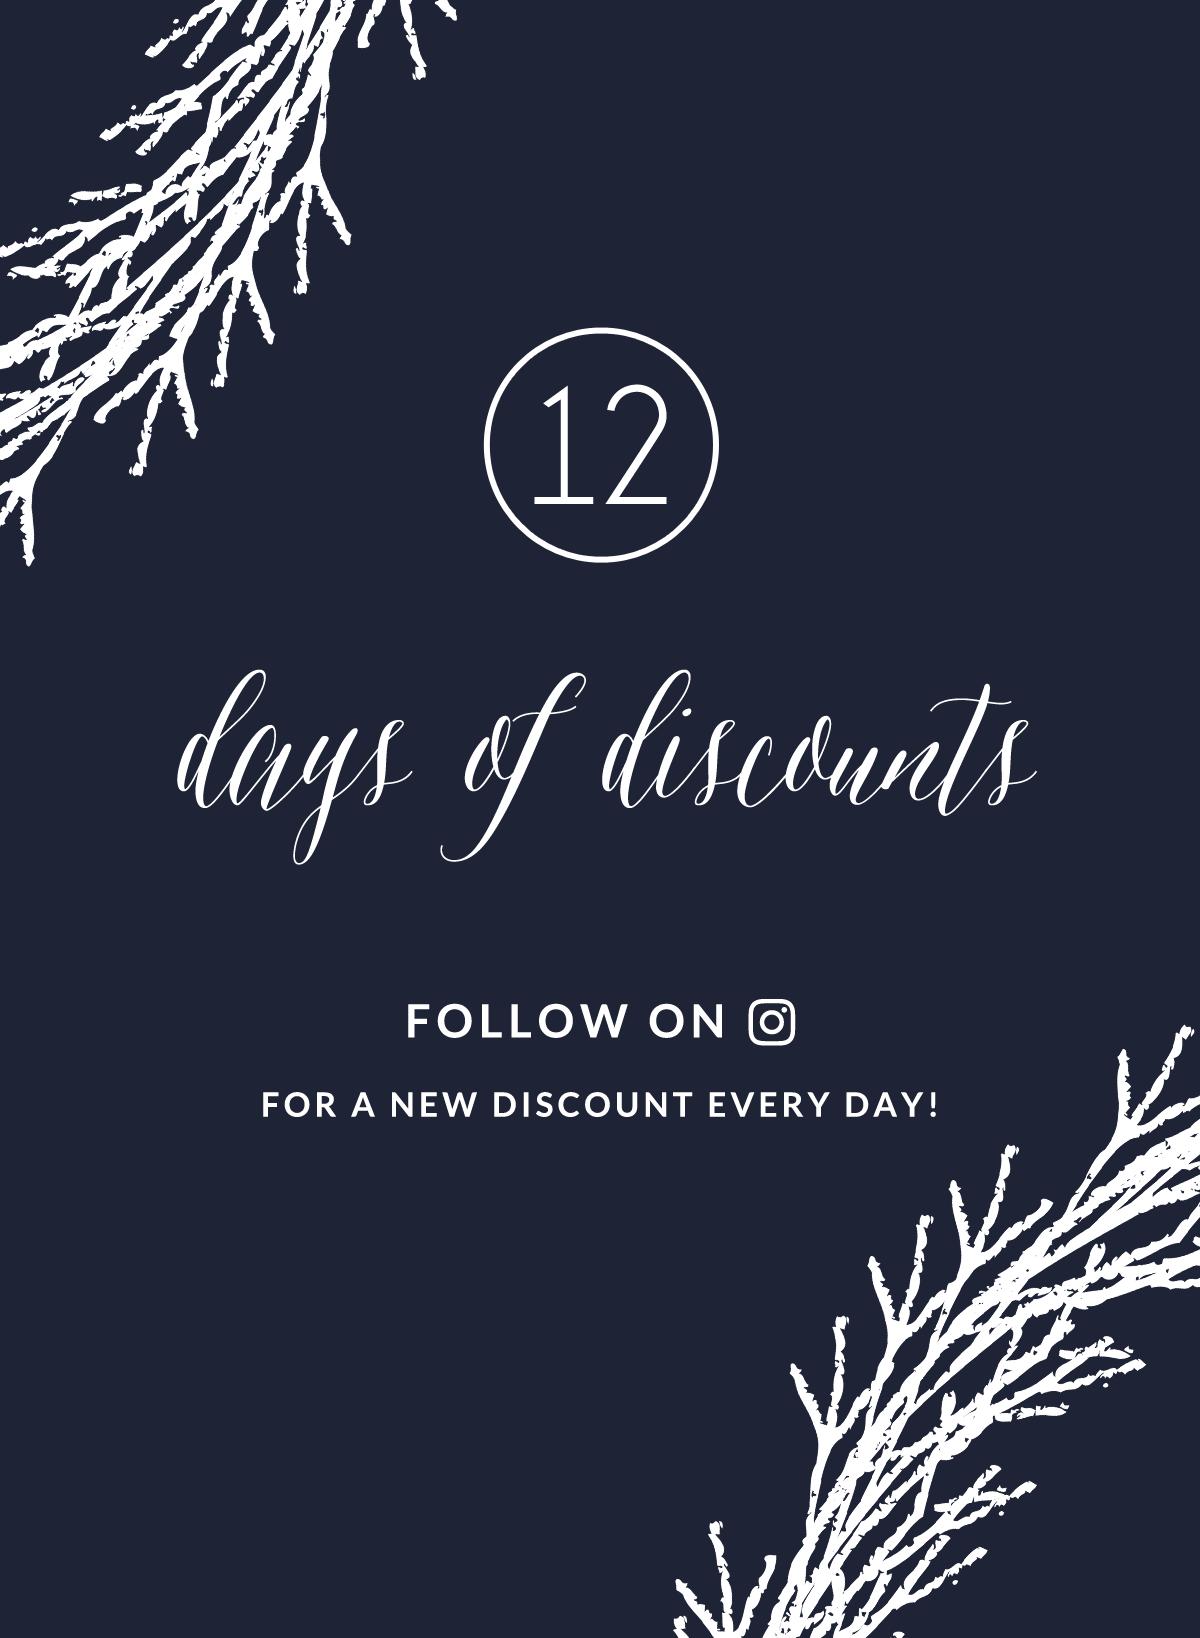 12 days of discounts at dinosaur stew